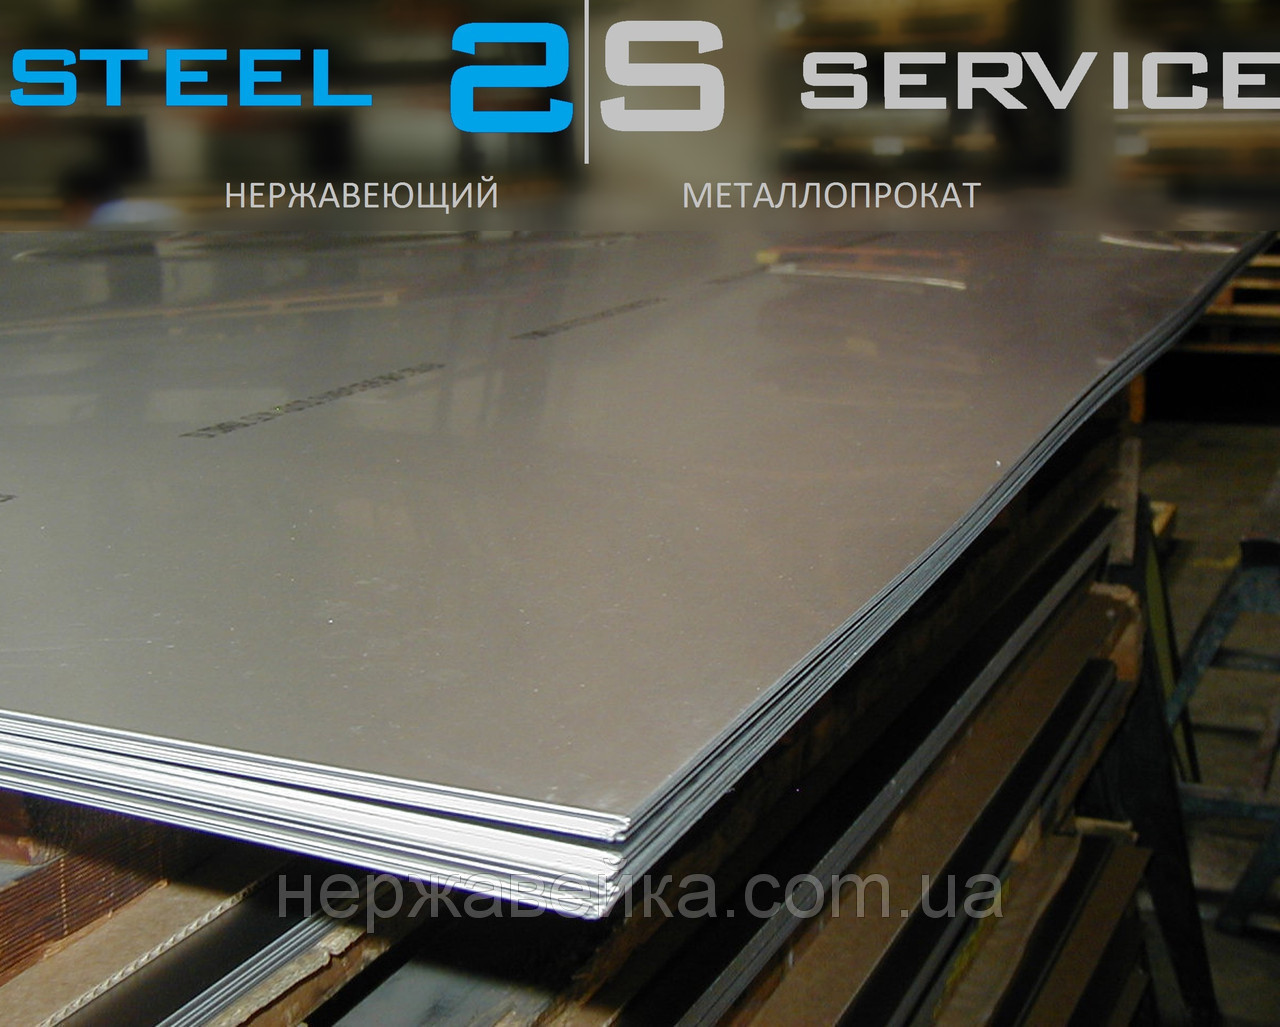 Нержавеющий лист 4х1250х2500мм  AISI 316L(03Х17Н14М3) 2B - матовый,  кислотостойкий